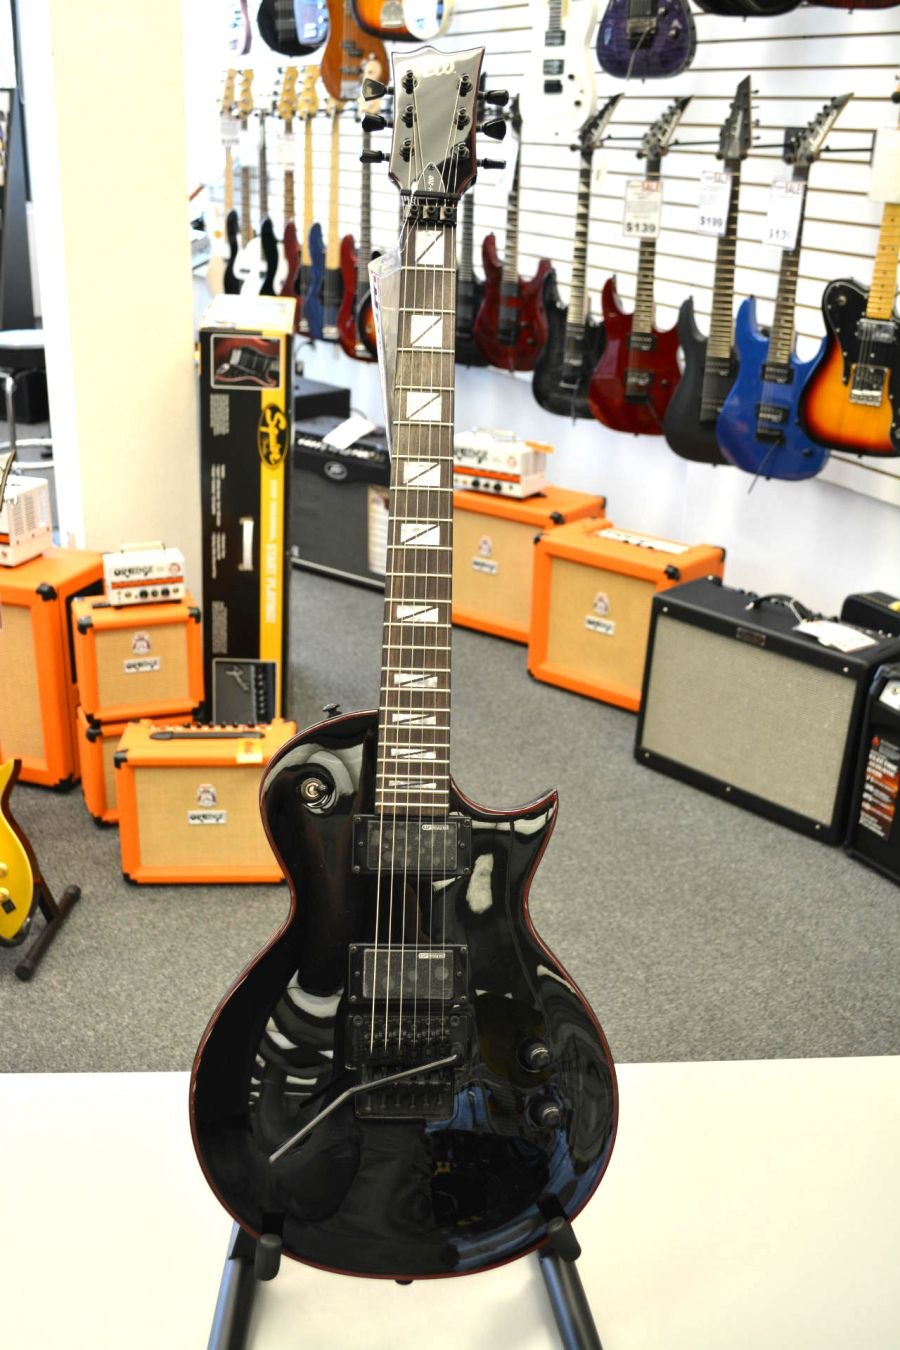 esp ltd gh 200 gary holt signature electric guitar. Black Bedroom Furniture Sets. Home Design Ideas